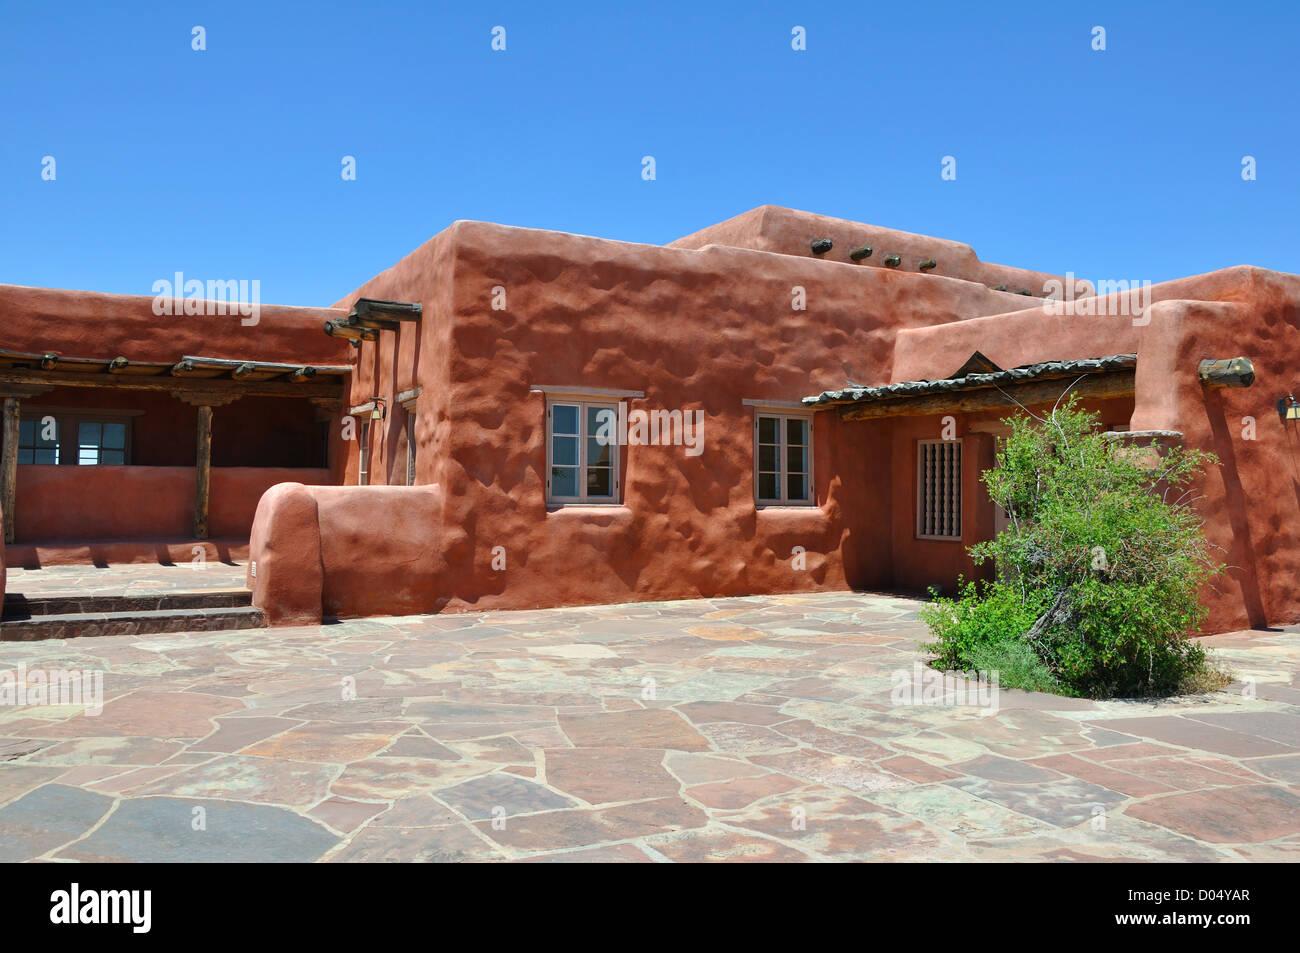 Adobe style house arizona usa stock photo 51740383 alamy for Arizona style homes